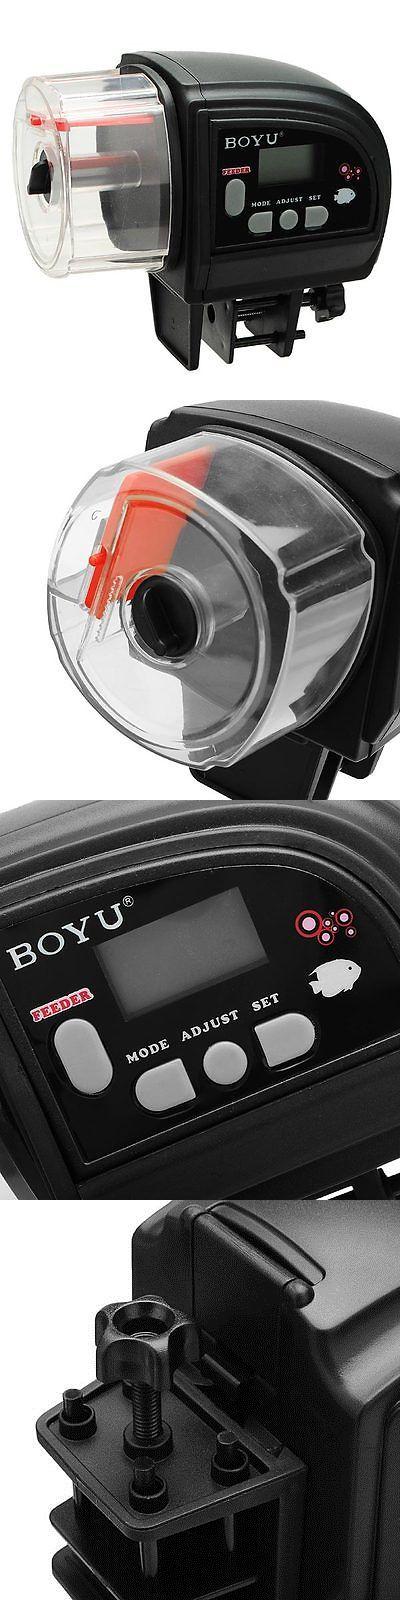 Feeders 63034: Boyu Zw-82 Automatic Fish Food Feeder For Aquarium Fish Tank Holiday Timer -> BUY IT NOW ONLY: $32.07 on eBay!